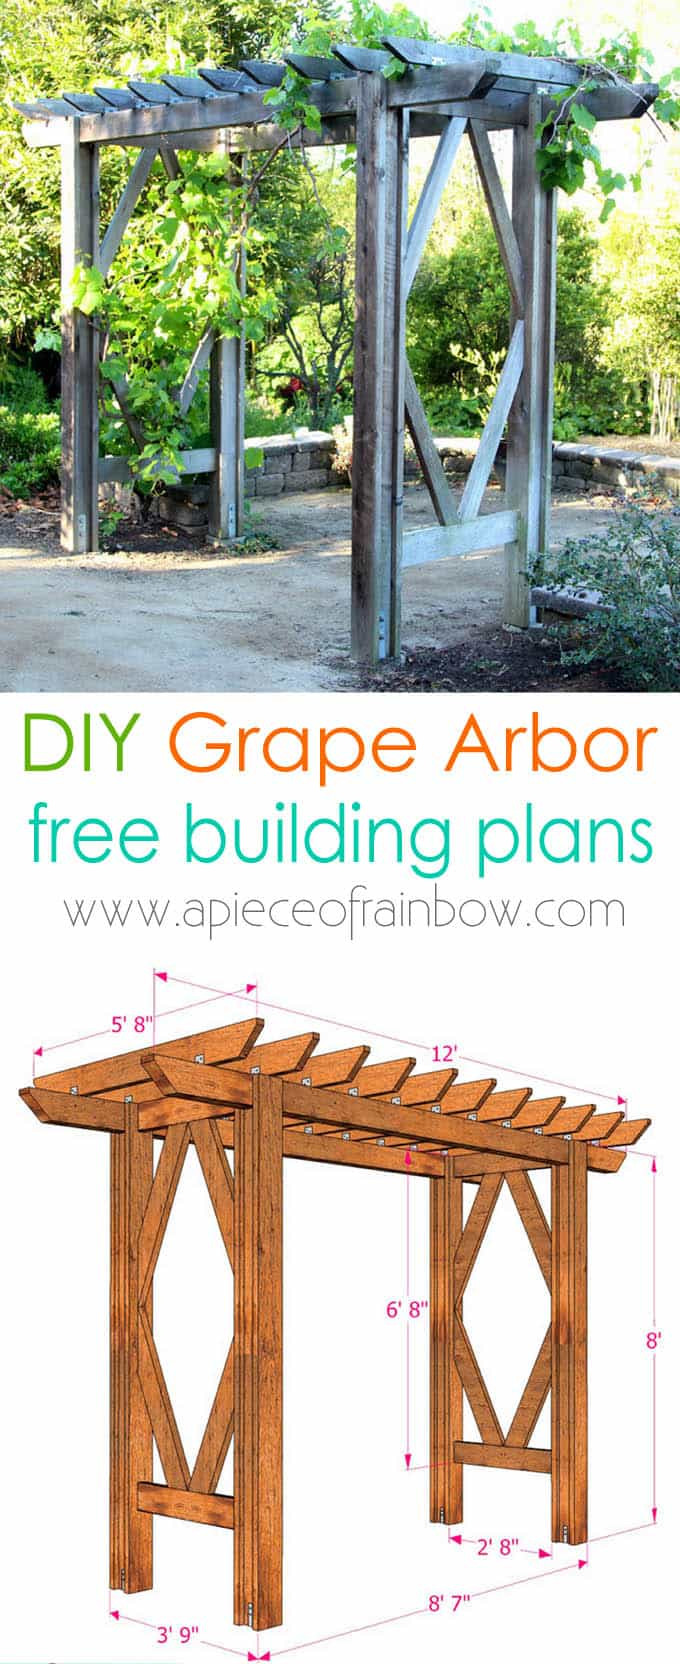 Best ideas about Arbor Plans DIY . Save or Pin DIY Grape Arbor Simple DIY Pergola Free Building Plan Now.